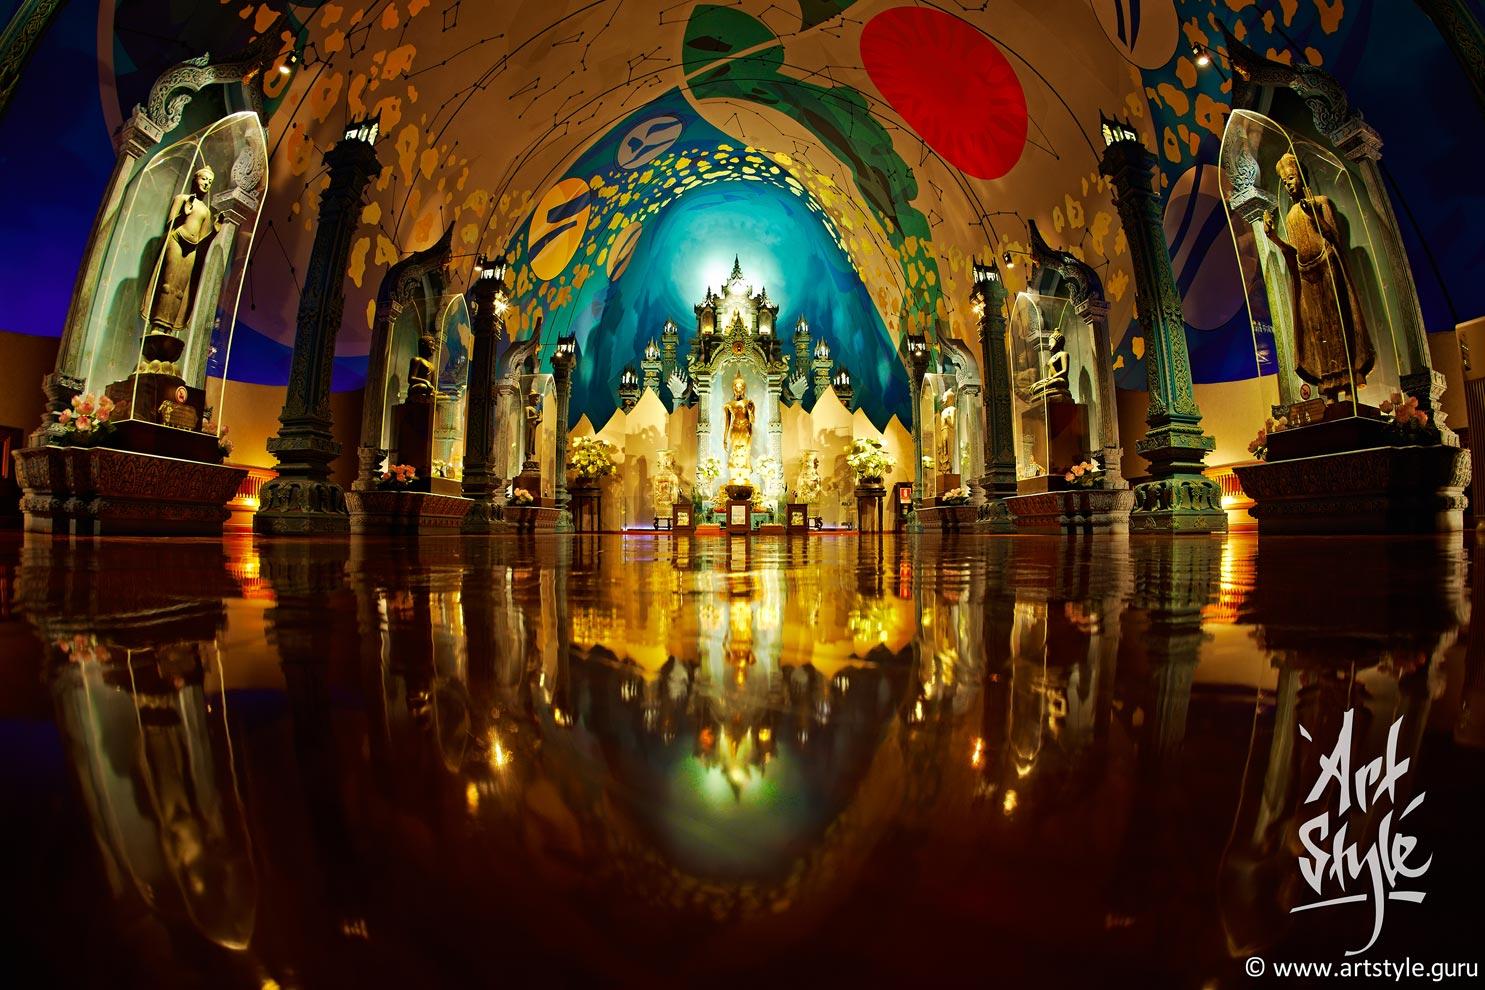 Shrine inside Erawan belly, Erawan museum/temple, Bangkok, Thailand.